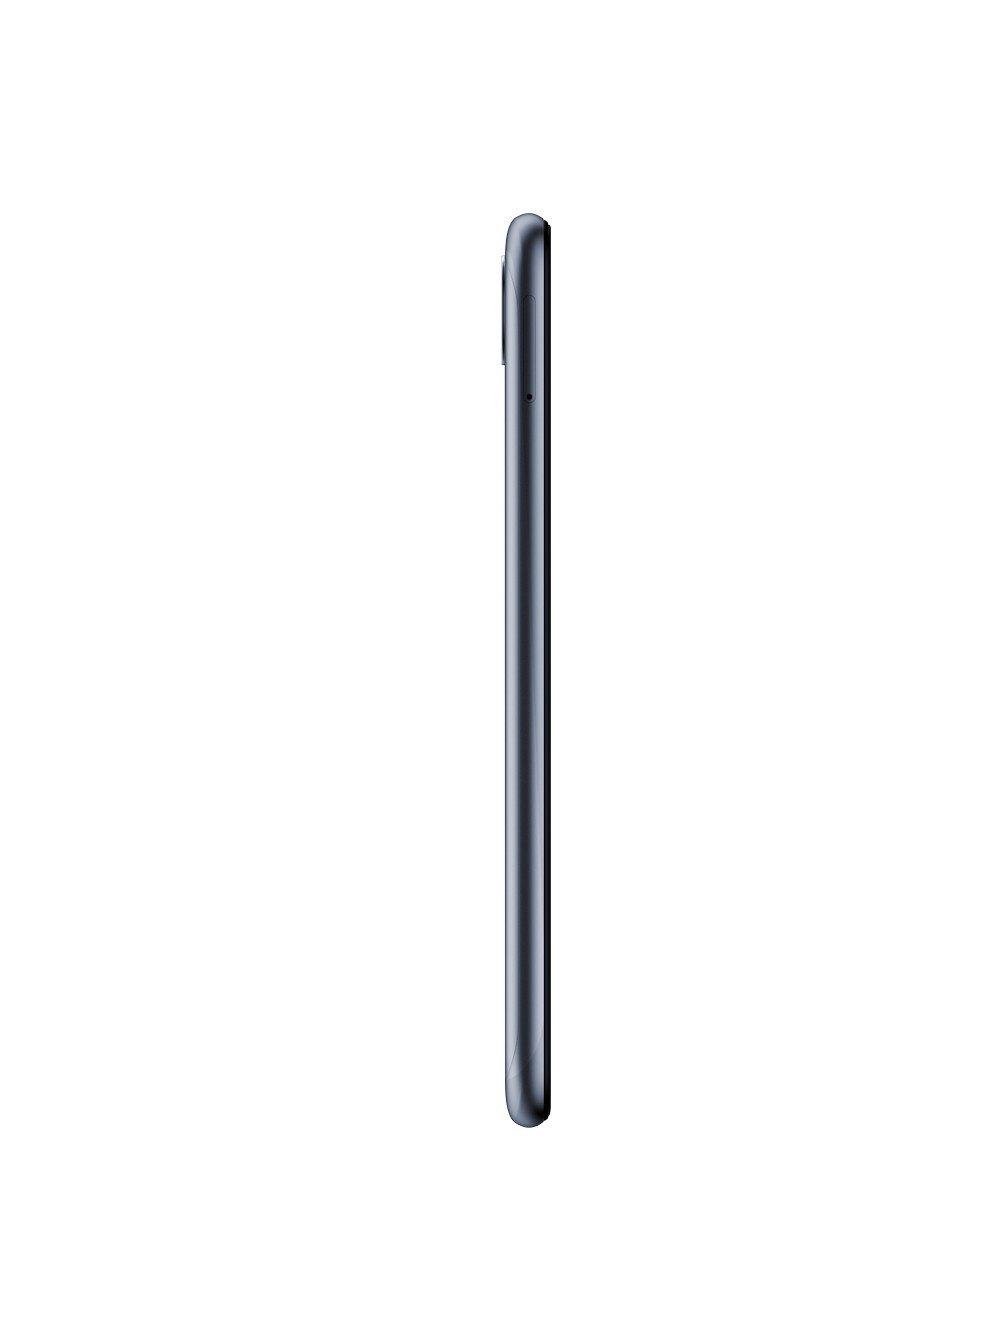 Смартфон Asus ZenFone Max (M2) (ZB633KL-4A070EU) 4/32 GB DUALSIM Black с чехлом фото 16